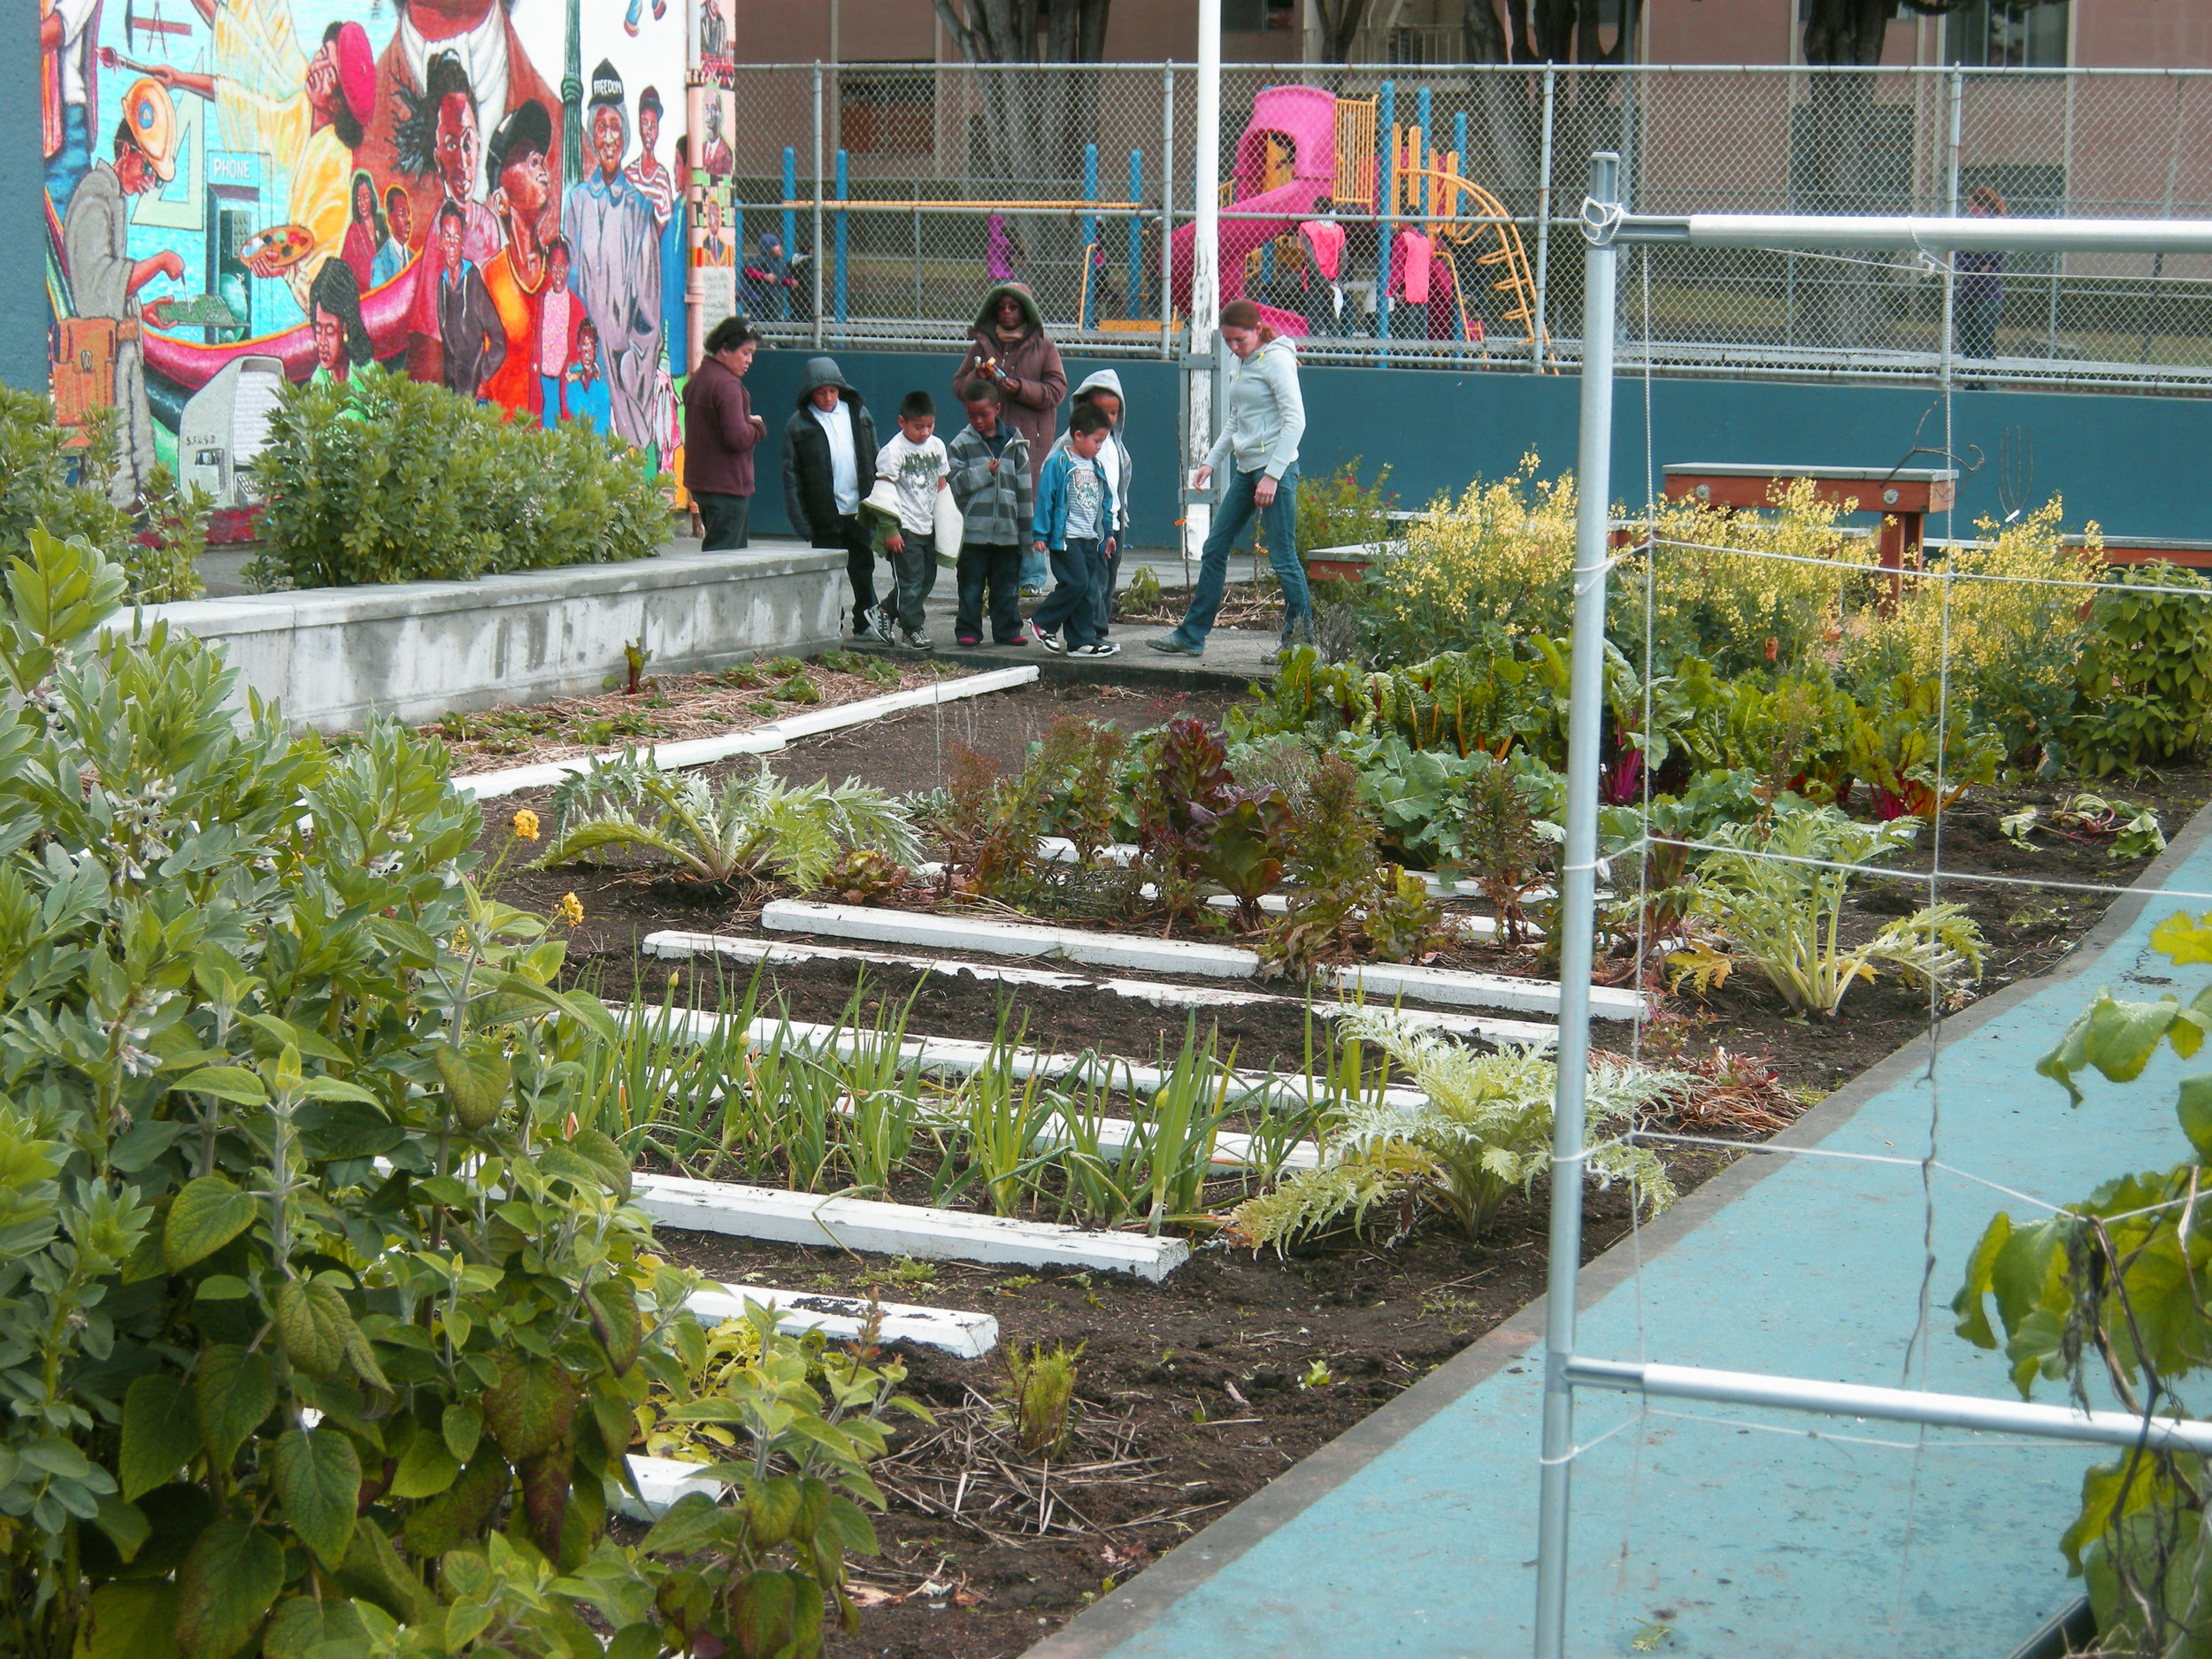 RosaPark_Crops in Garden_r.jpg